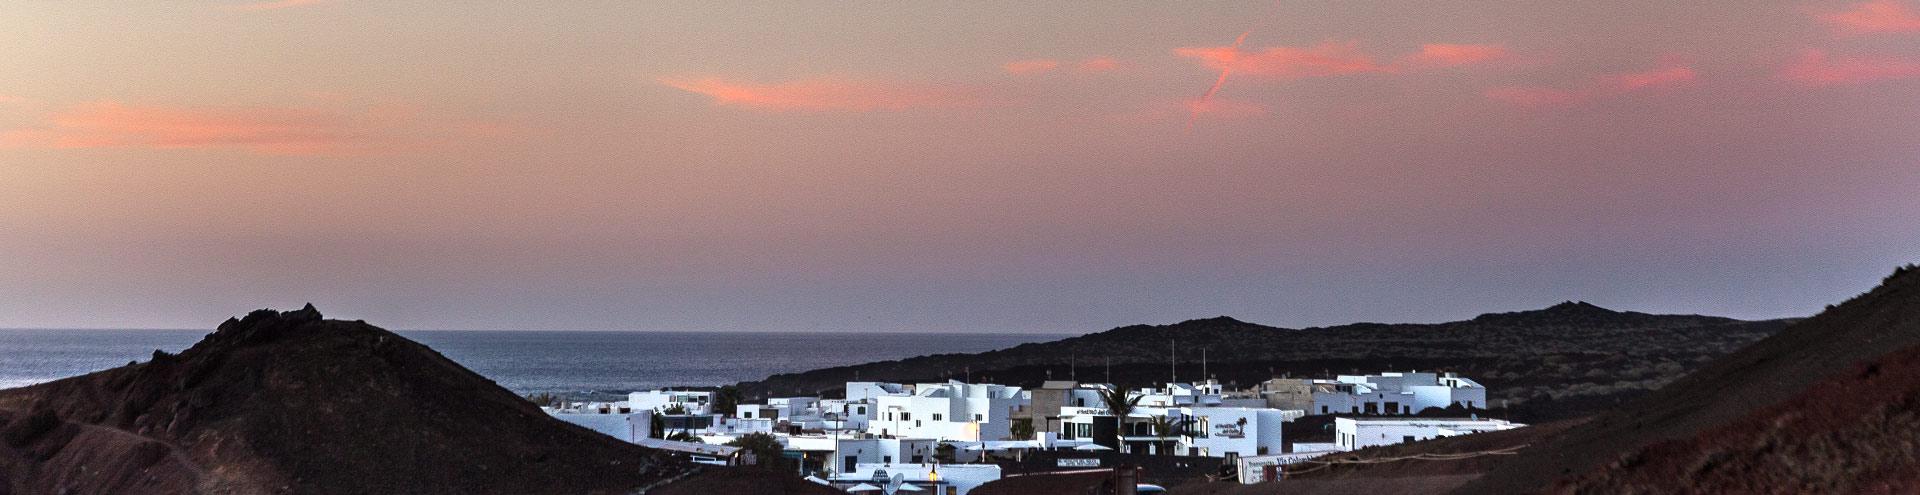 Abendstimmung El Golfo / Lanzarote